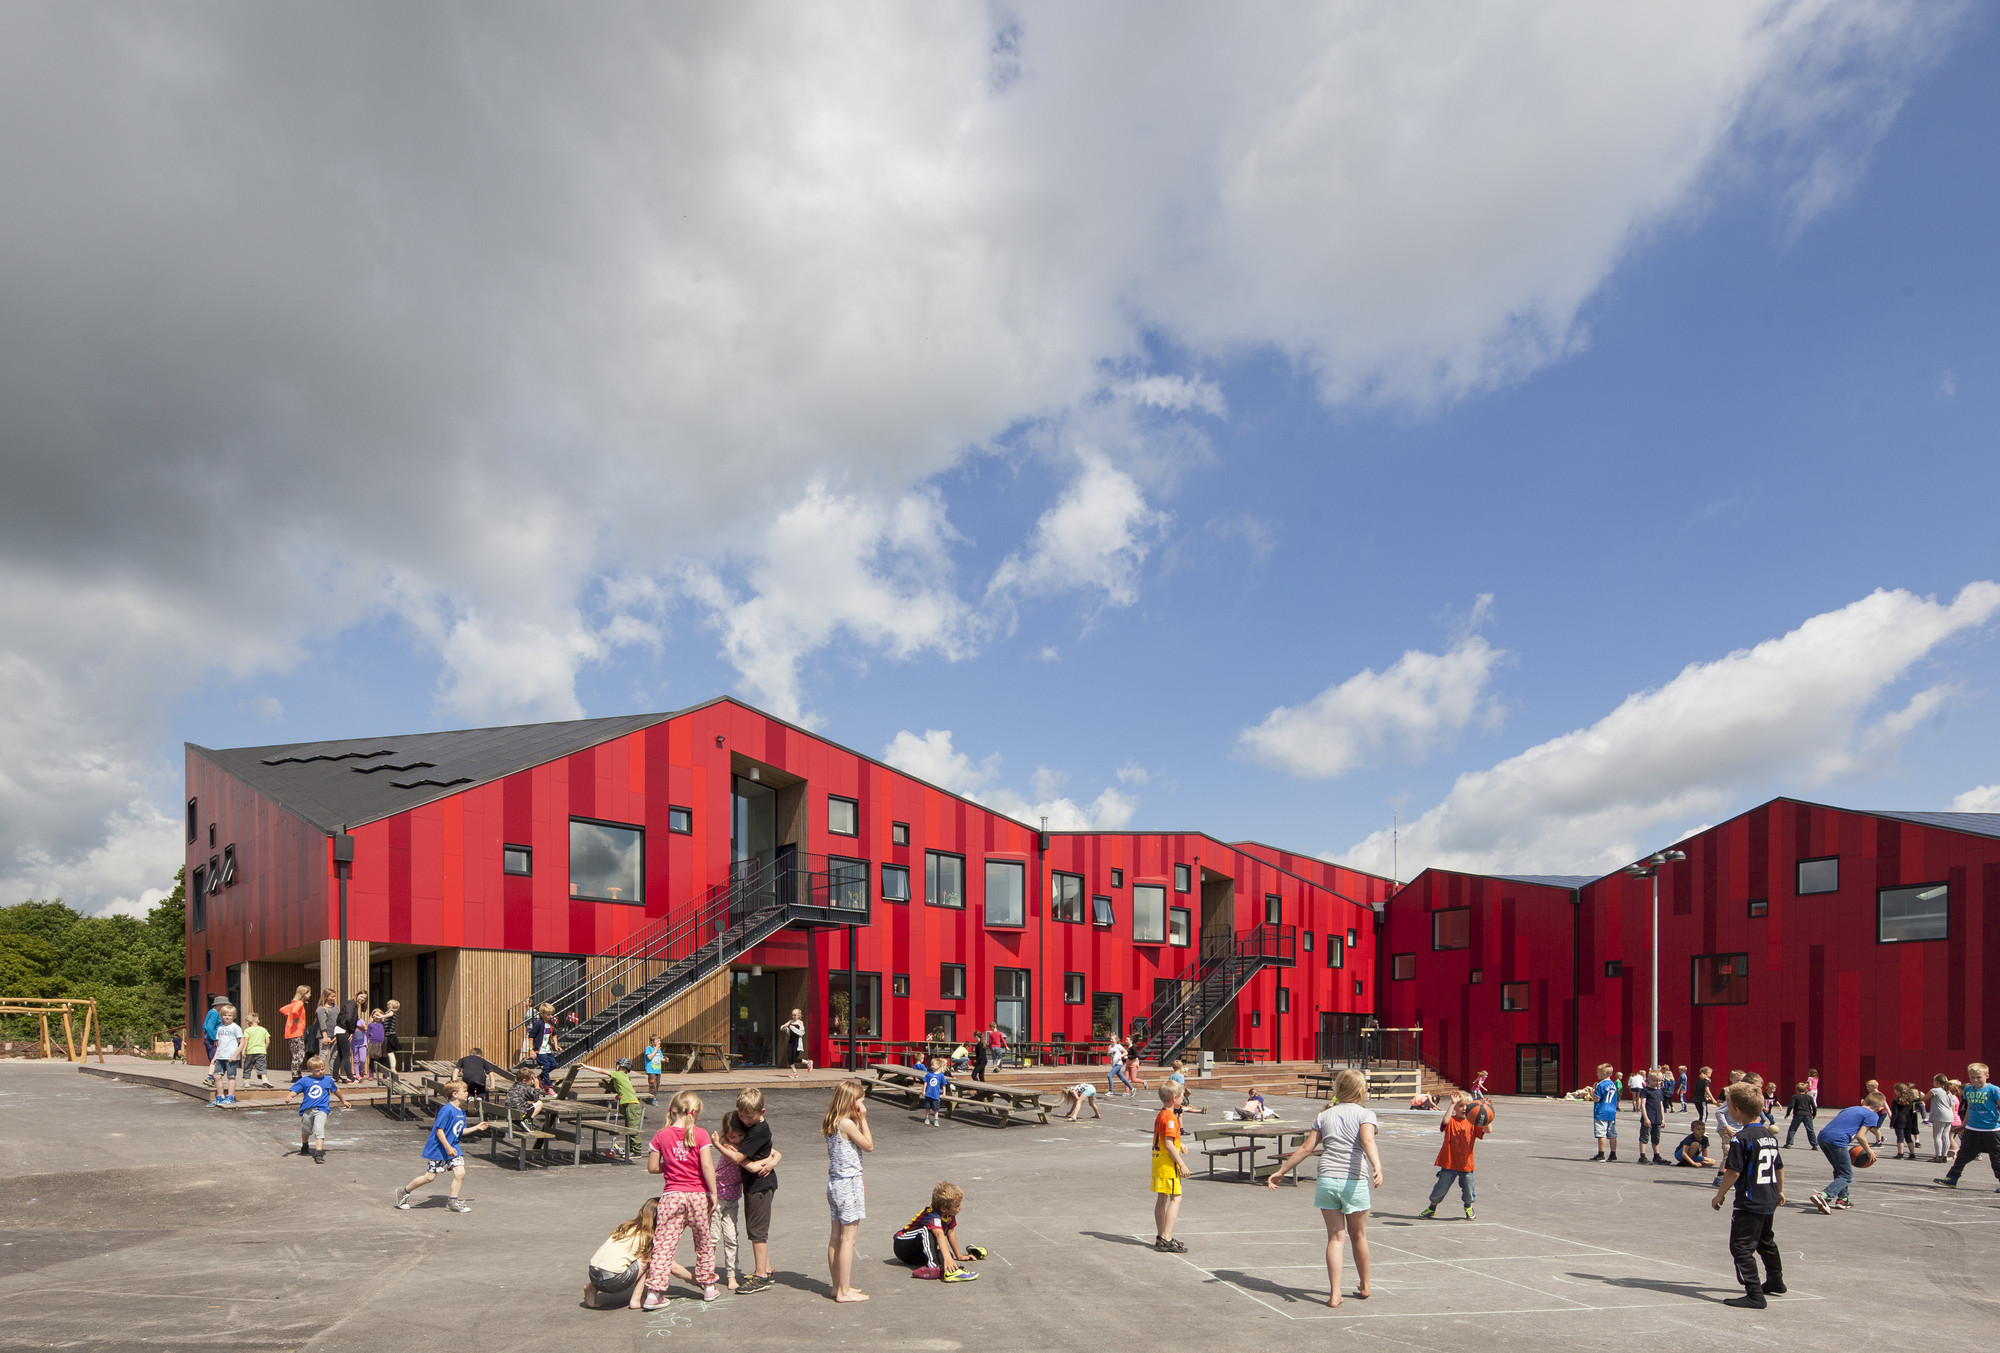 The Vibeeng School / Arkitema Architects, Courtesy of Arkitema Architects